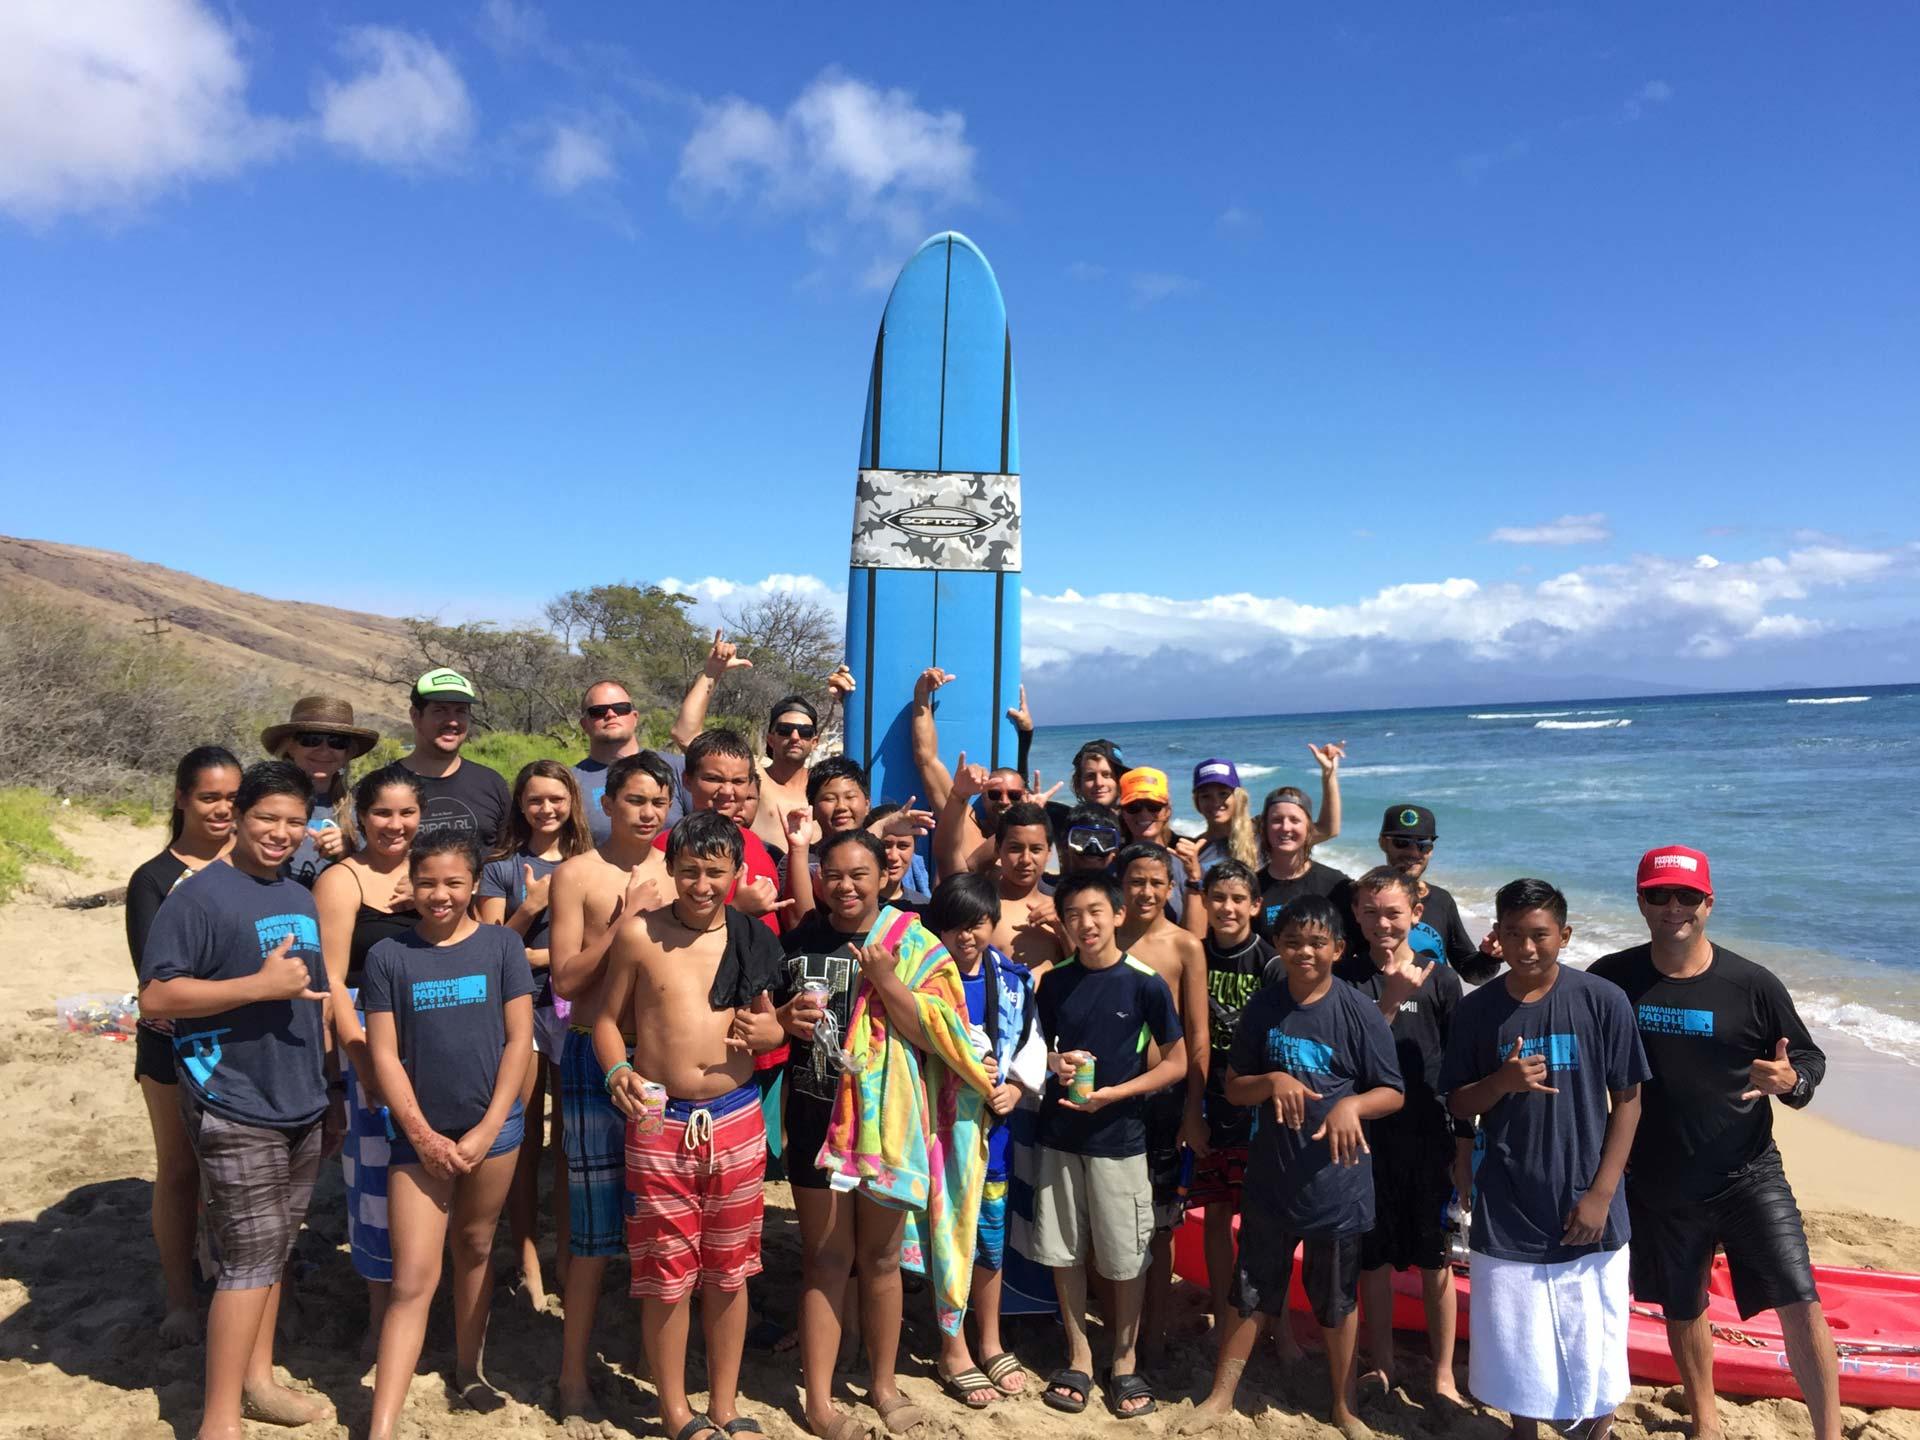 Malama Maui 2017 - Our Give-Back Program